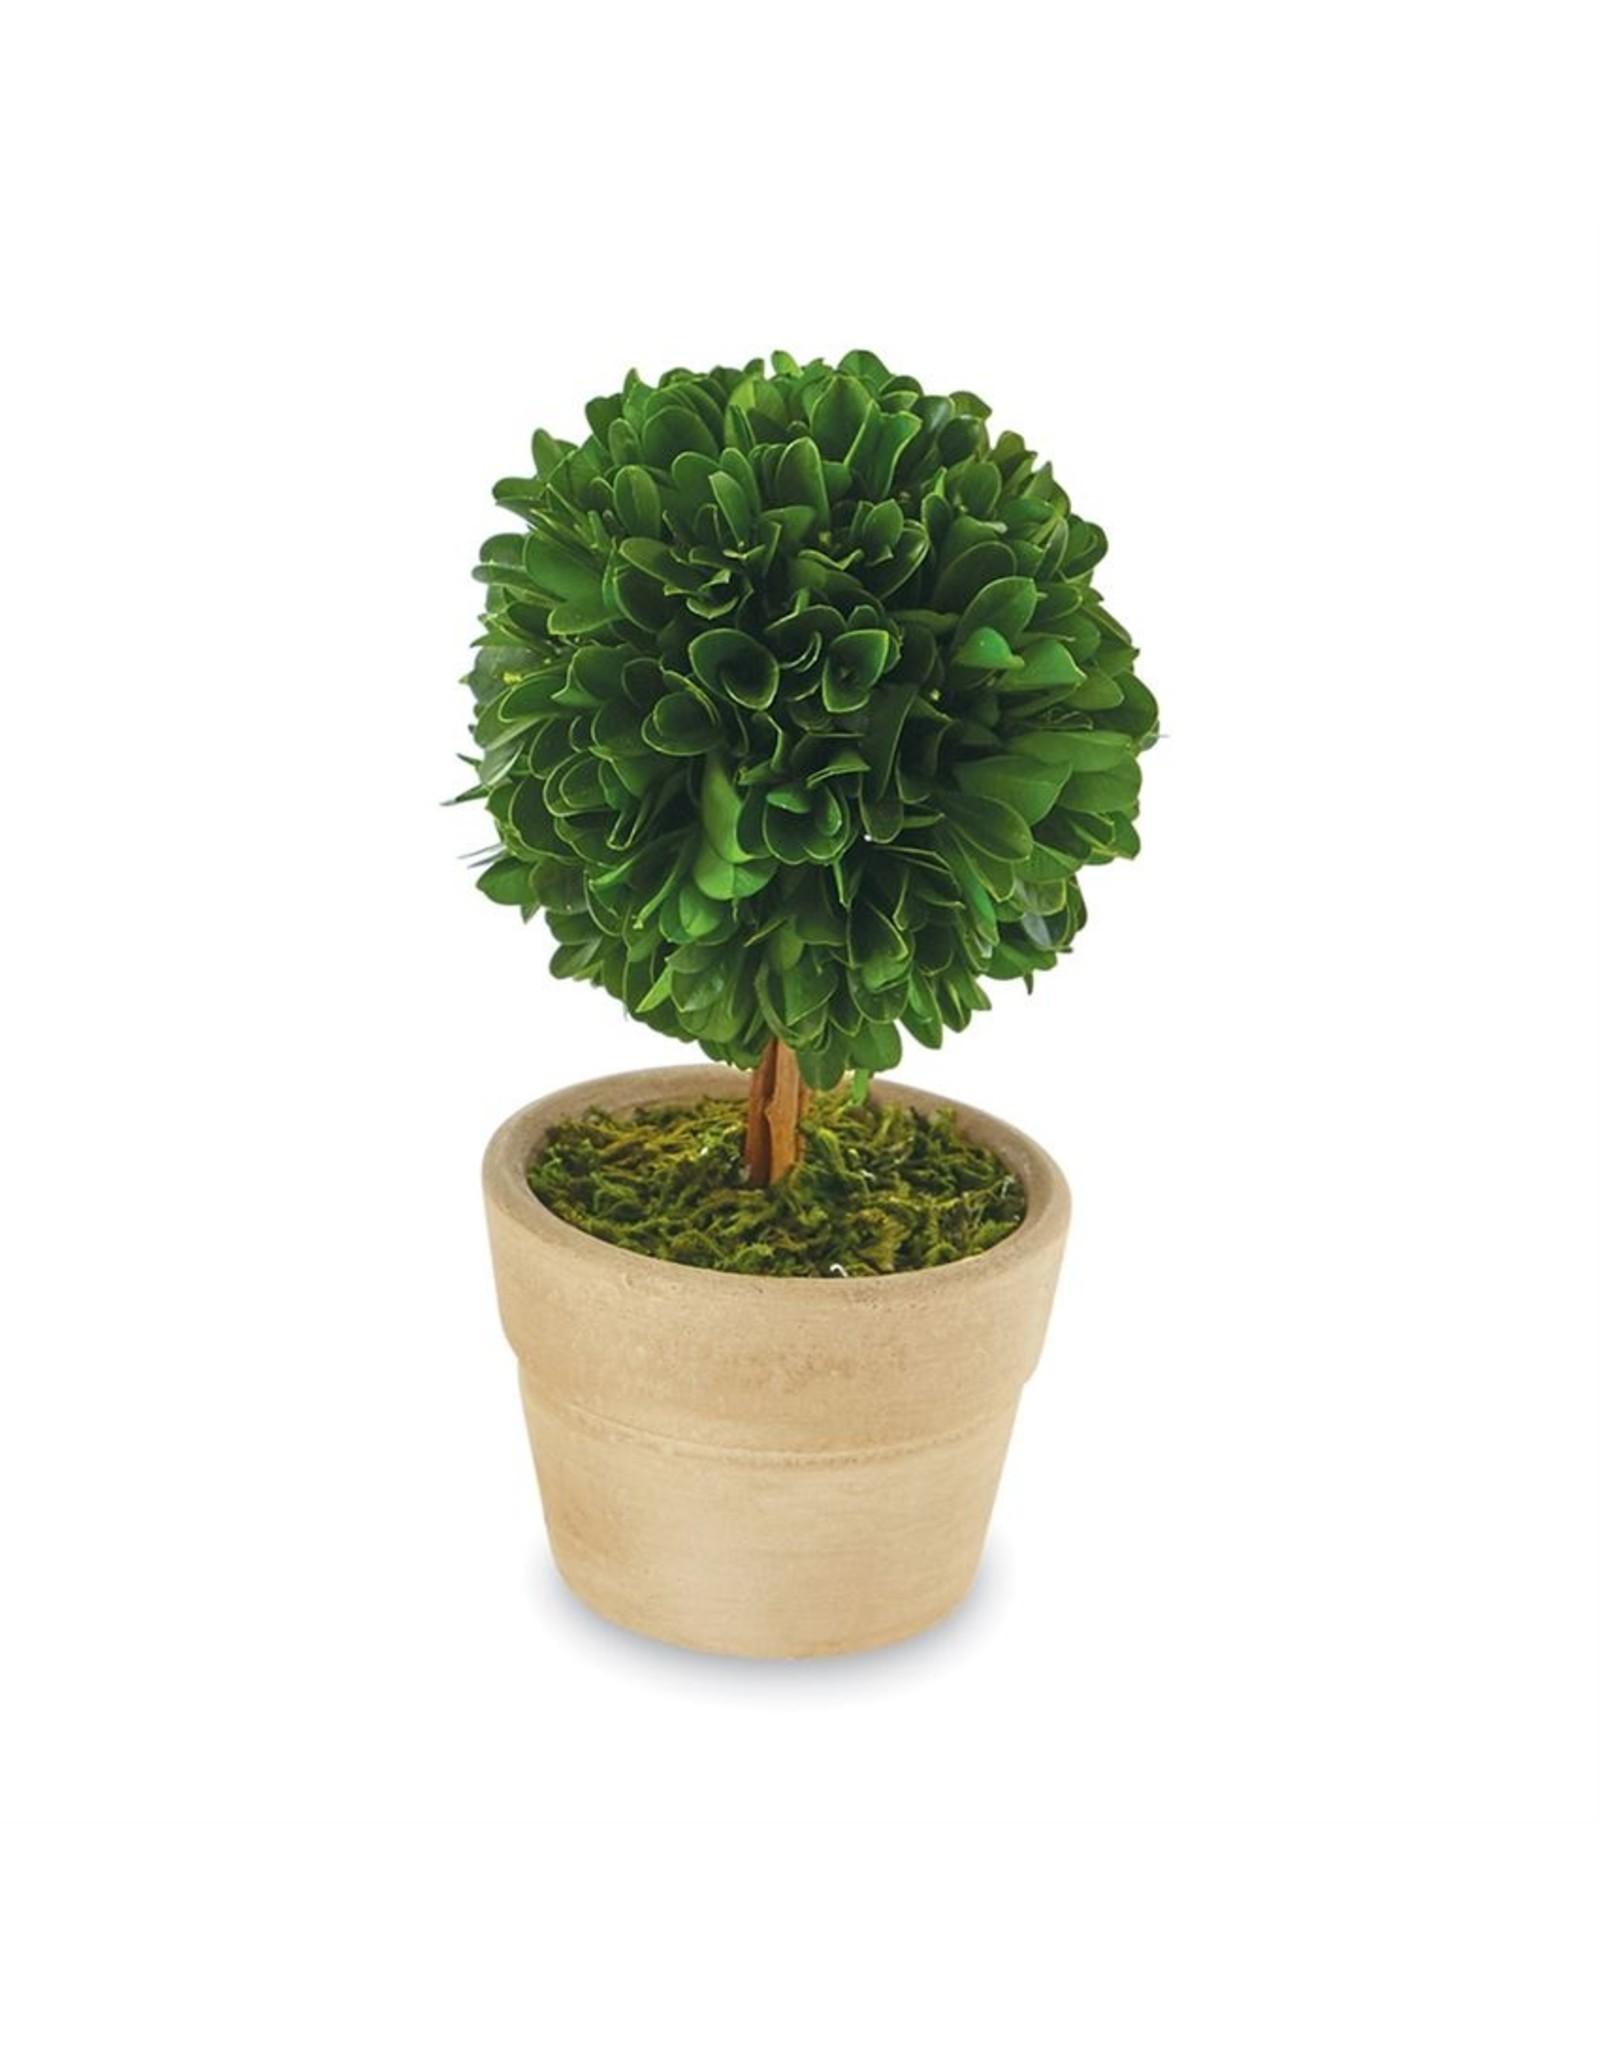 MudPie Stem Small Boxwood Topiary